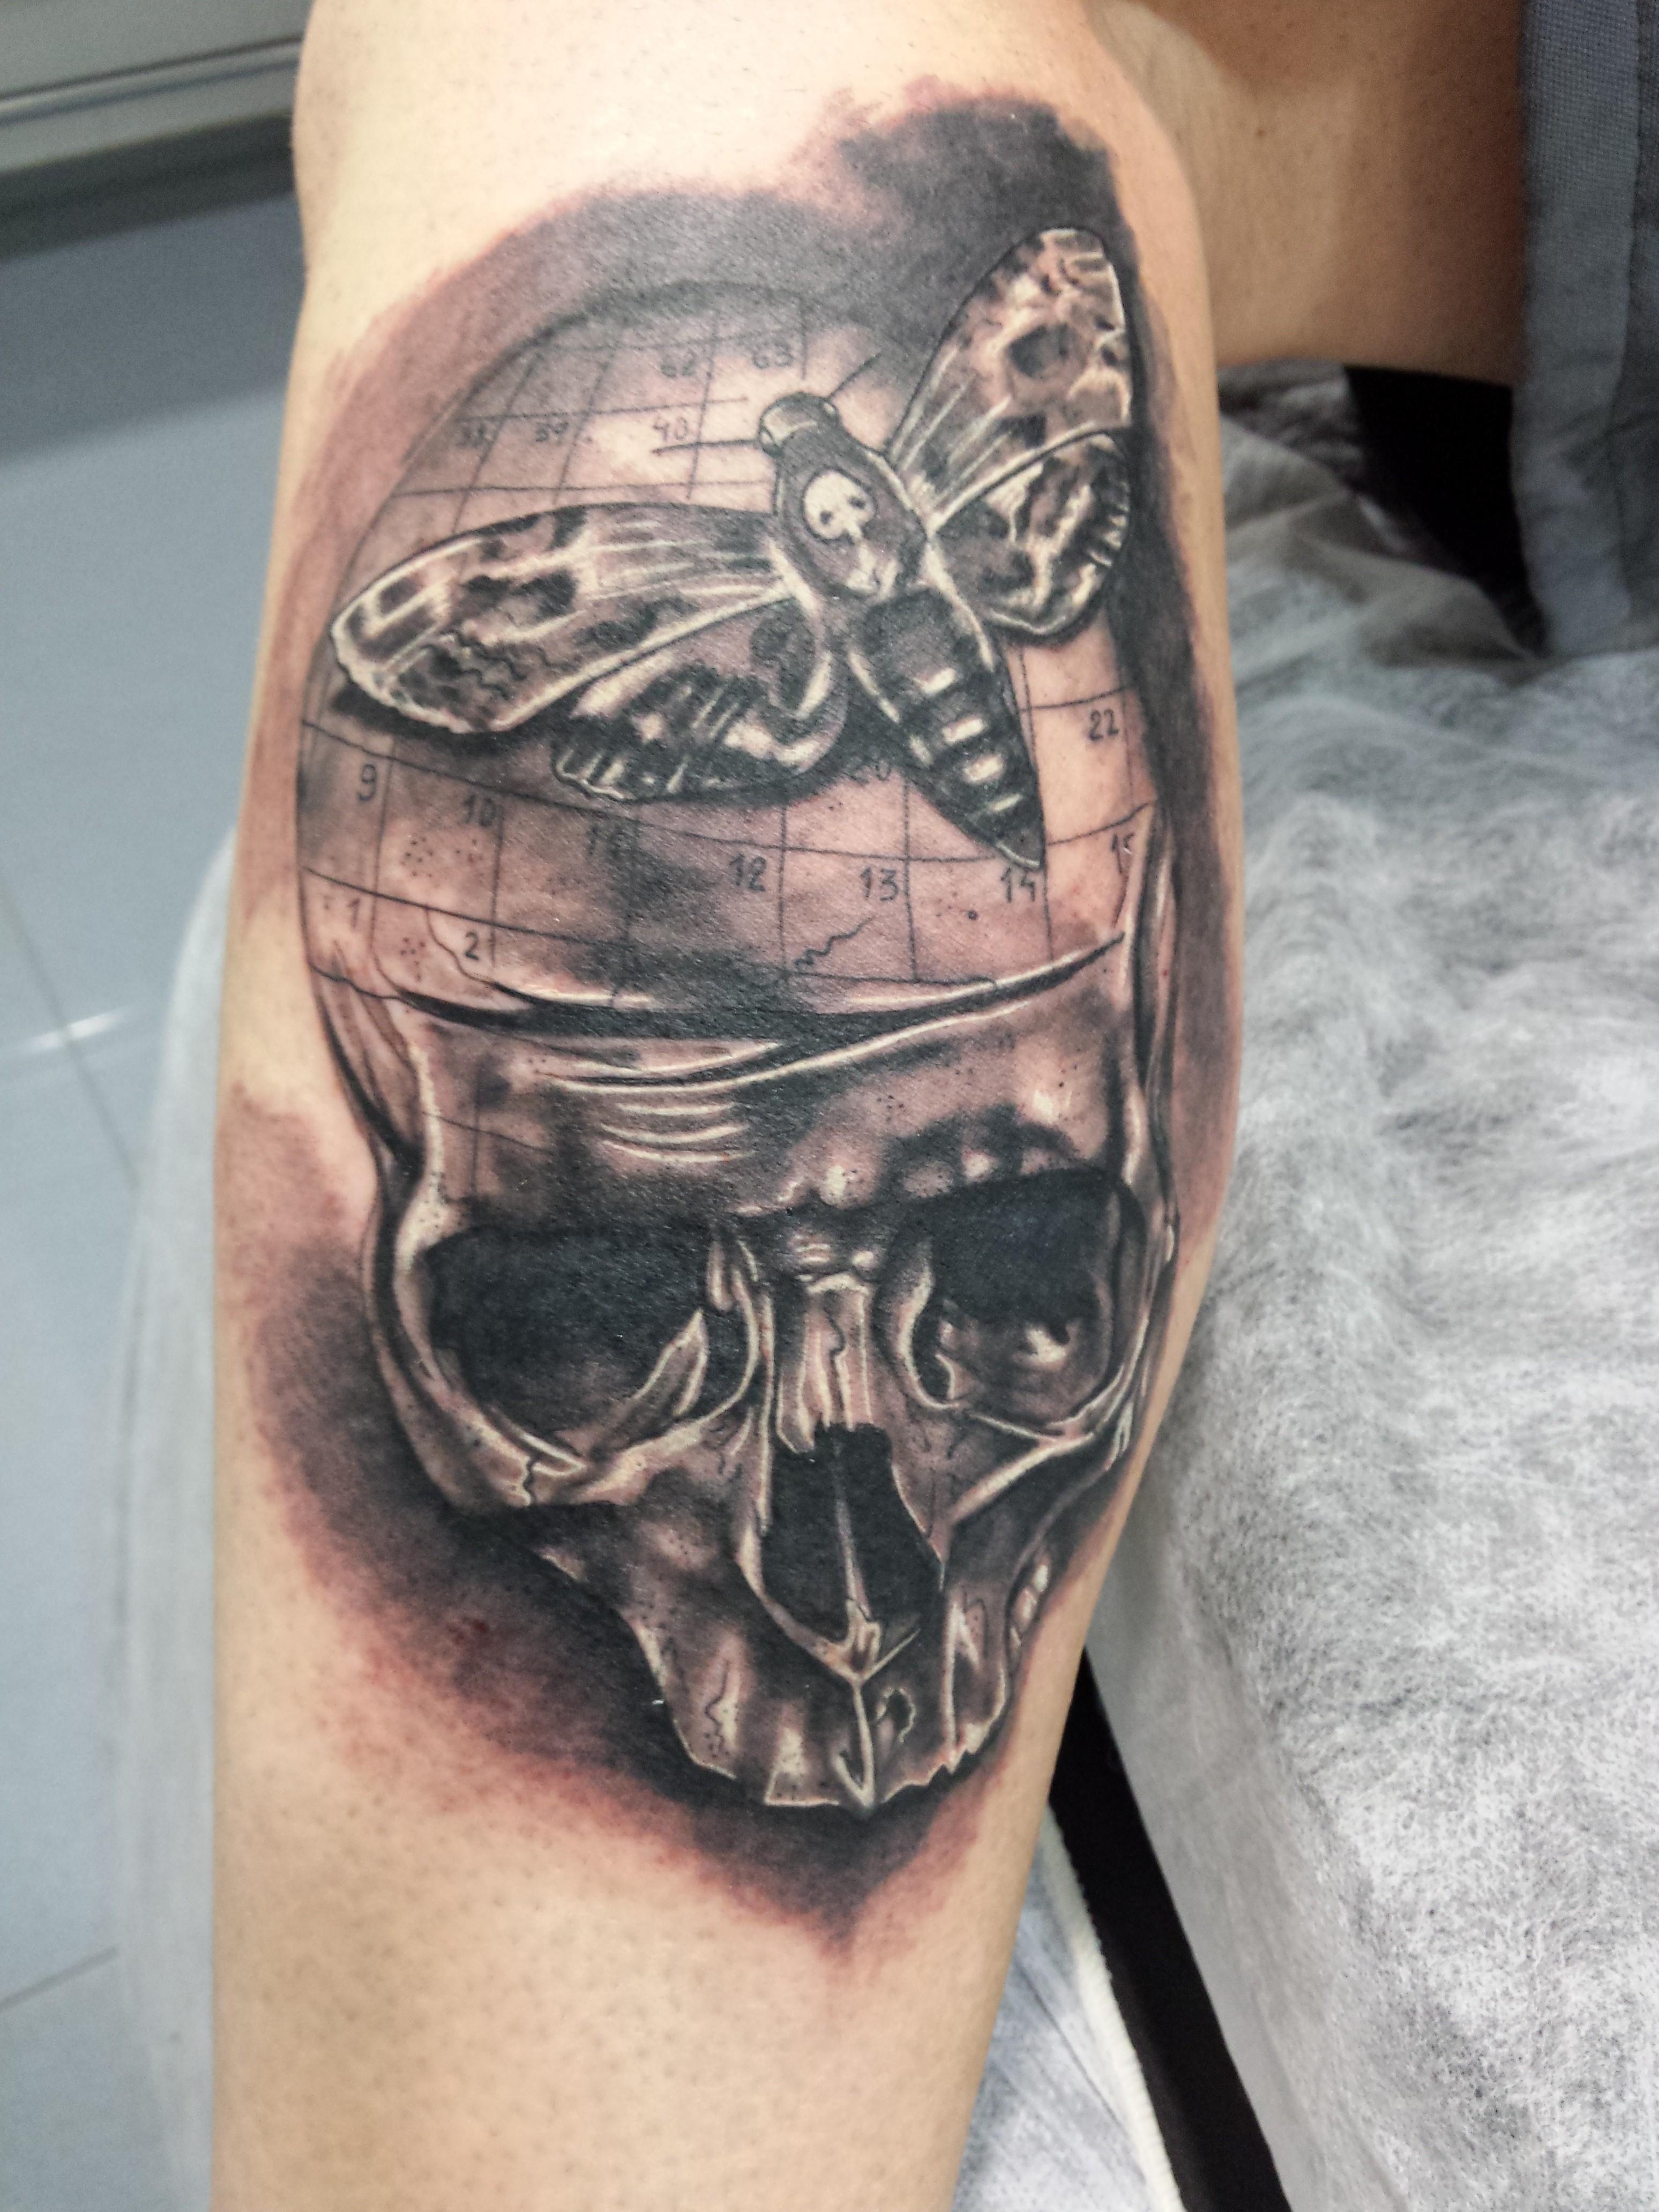 calavera-skull-Jorge García-Tauajes L'Eliana